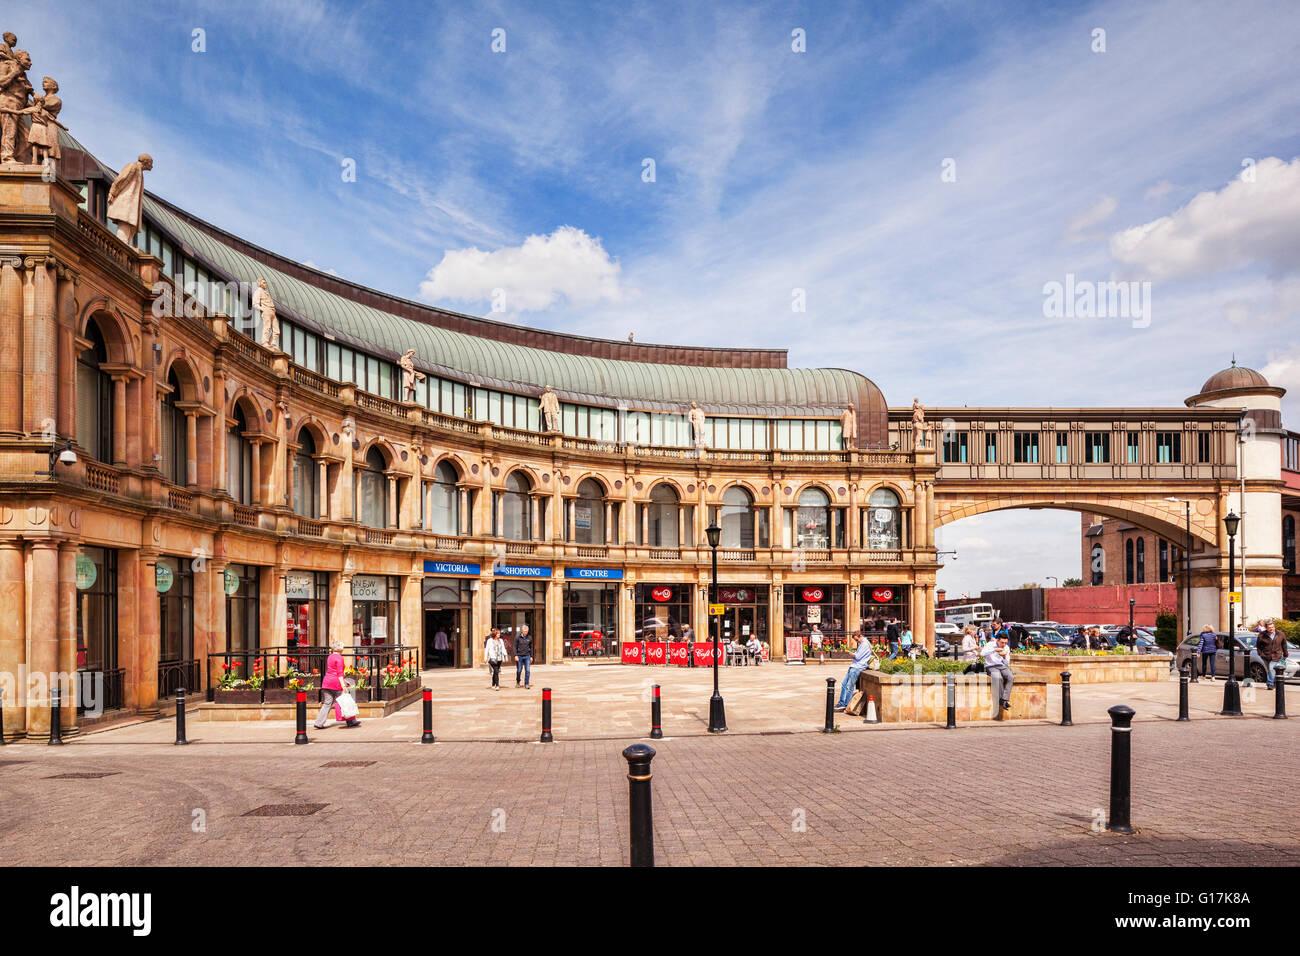 Victoria Shopping Centre, Harrogate, North Yorkshire, England, UK - Stock Image